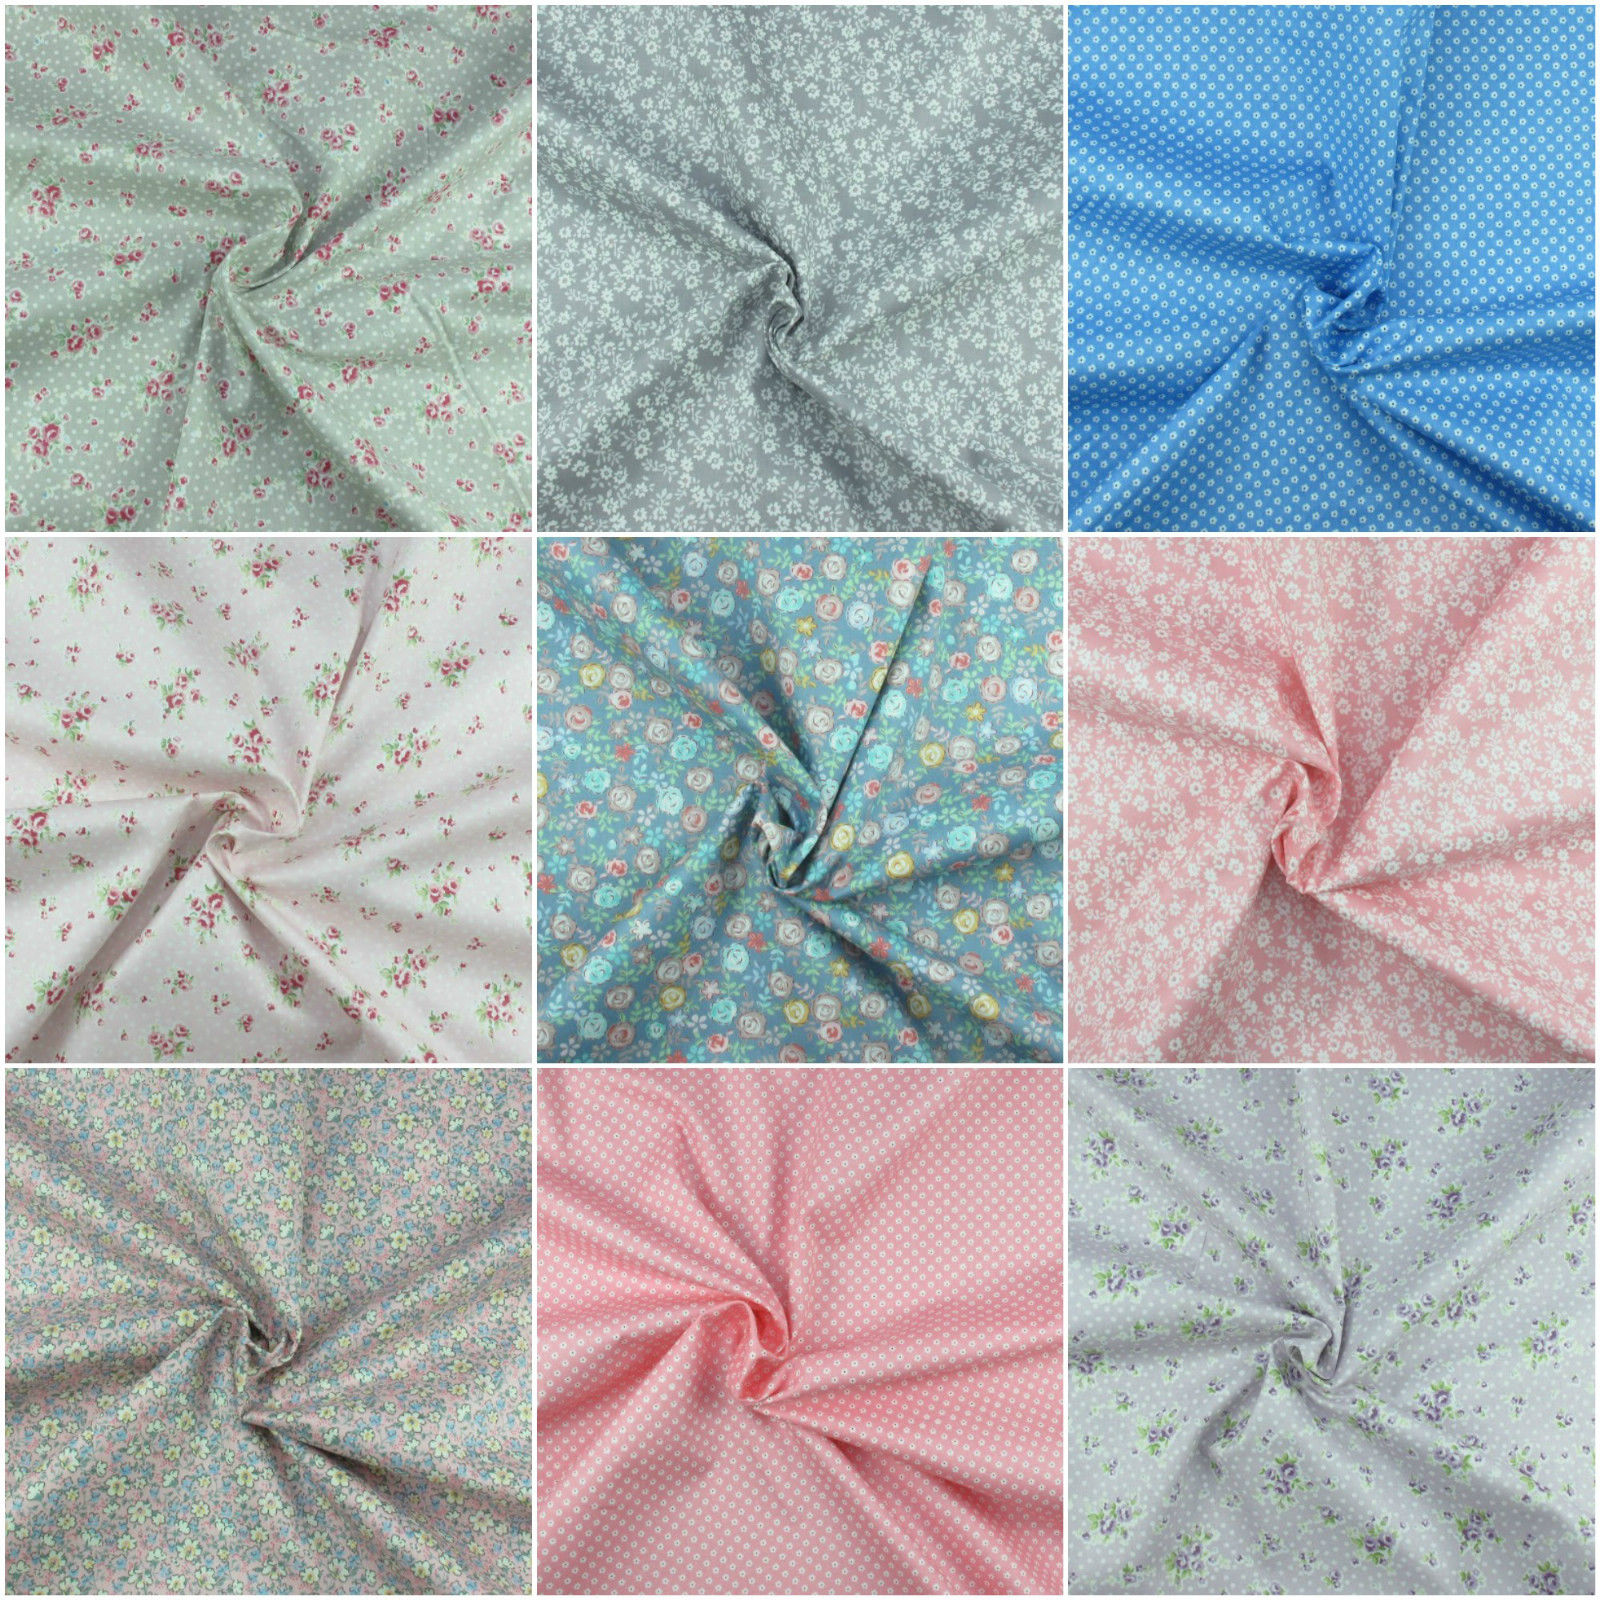 100% Cotton Fabric, Floral Prints, Extra Wide, Metre, 1/2 Metre Or Fat Quarter